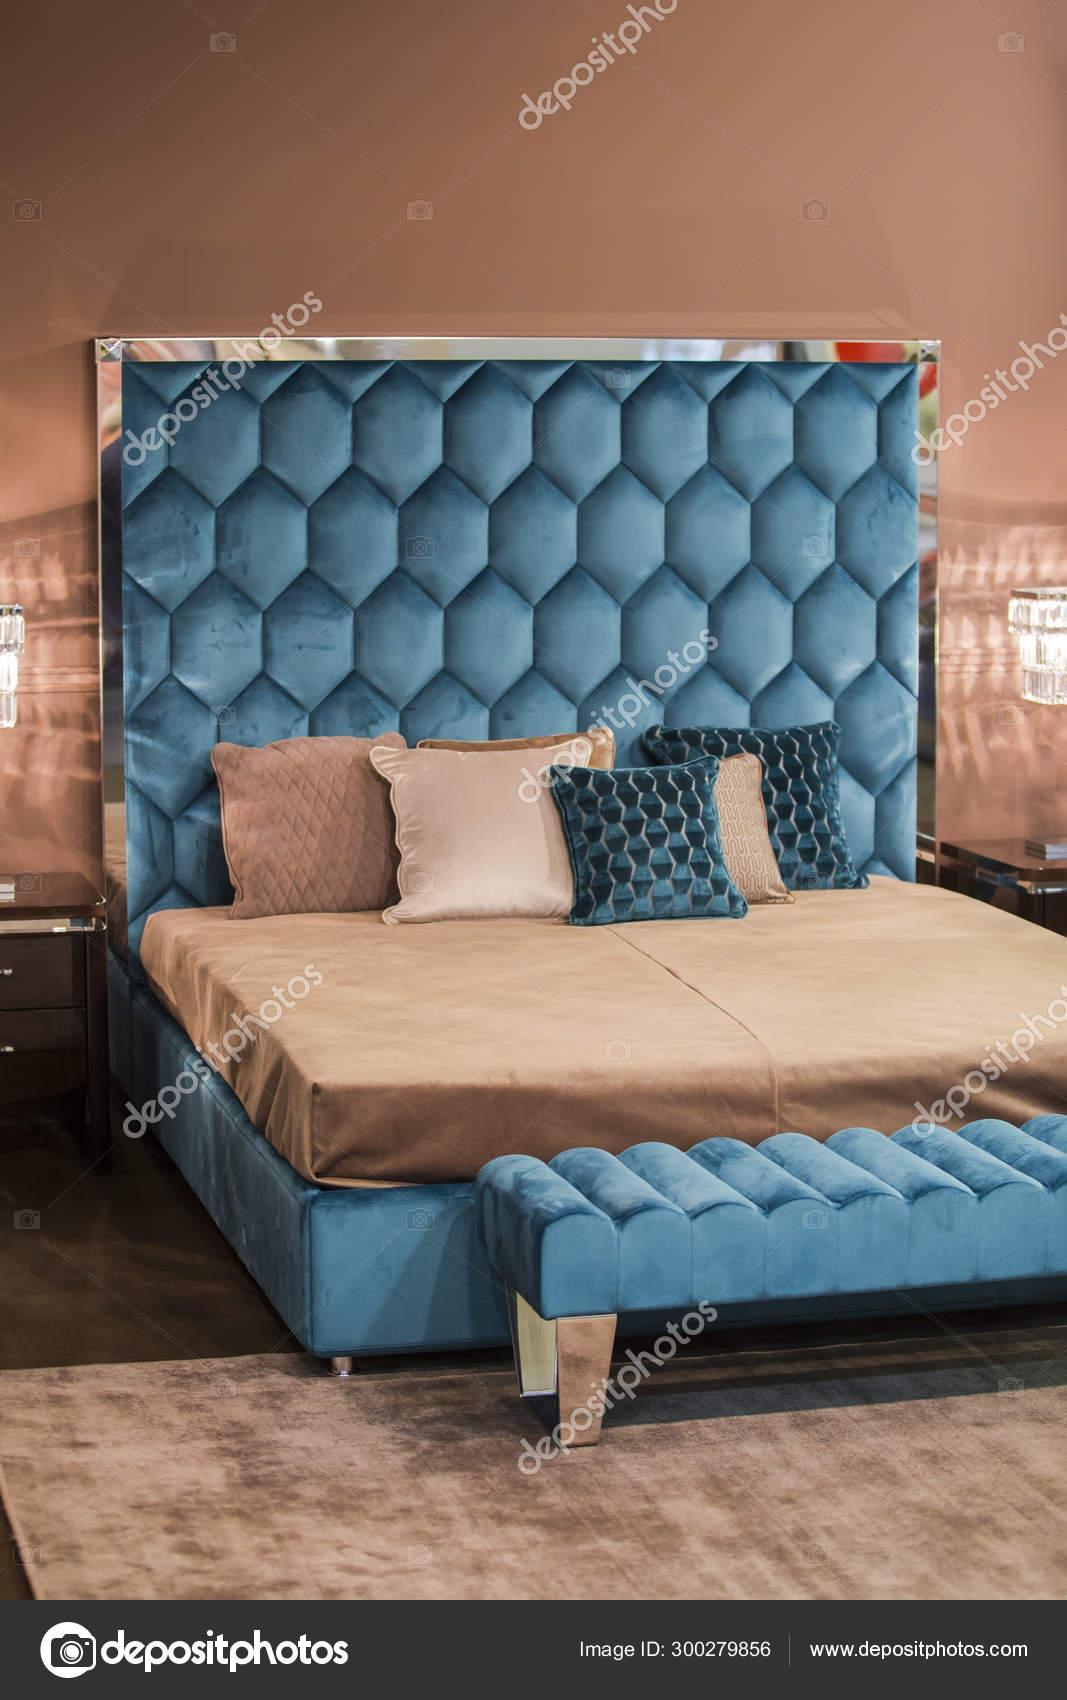 Modern Interior Blue Velvet Bed In Art Nouveau Style Crystal Gold Chandeliers Pink Walls Stock Photo C Olga Prava 300279856